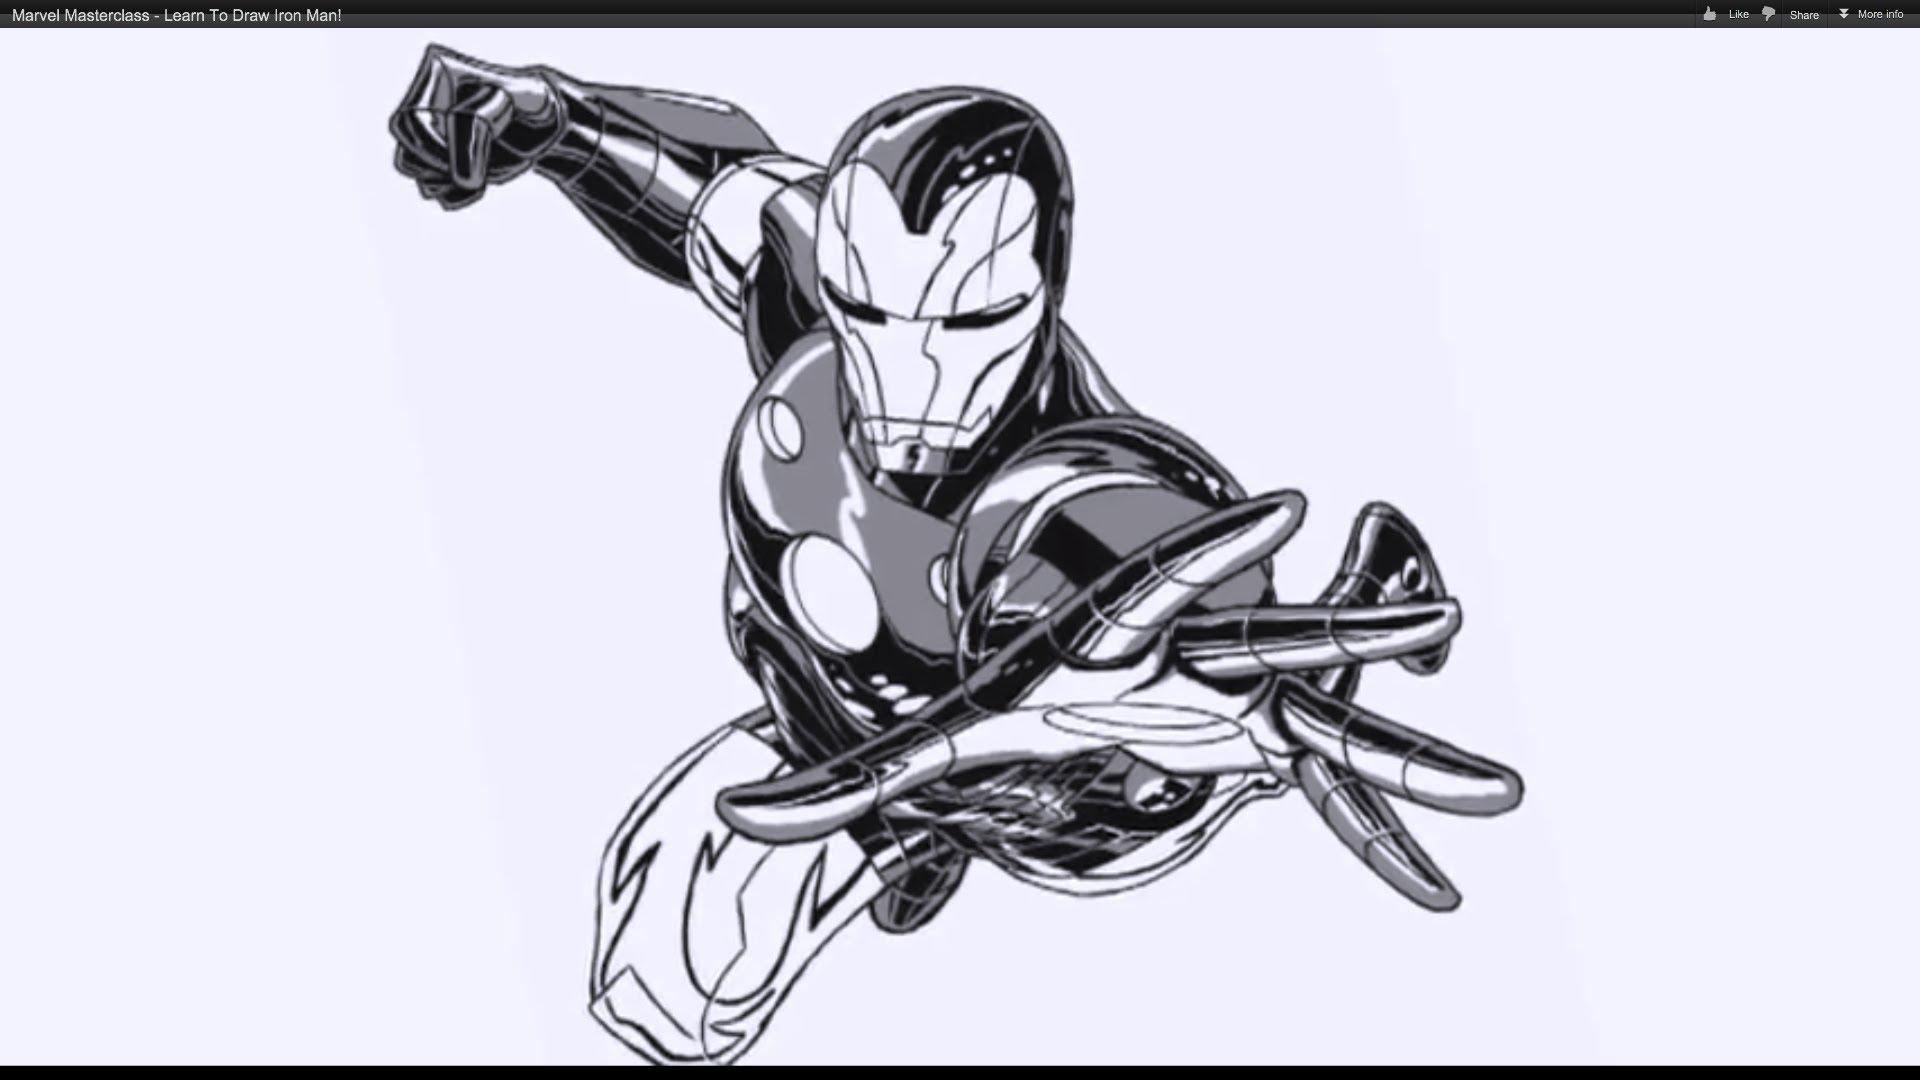 And Deadpool Superhero Spider Drawings Man